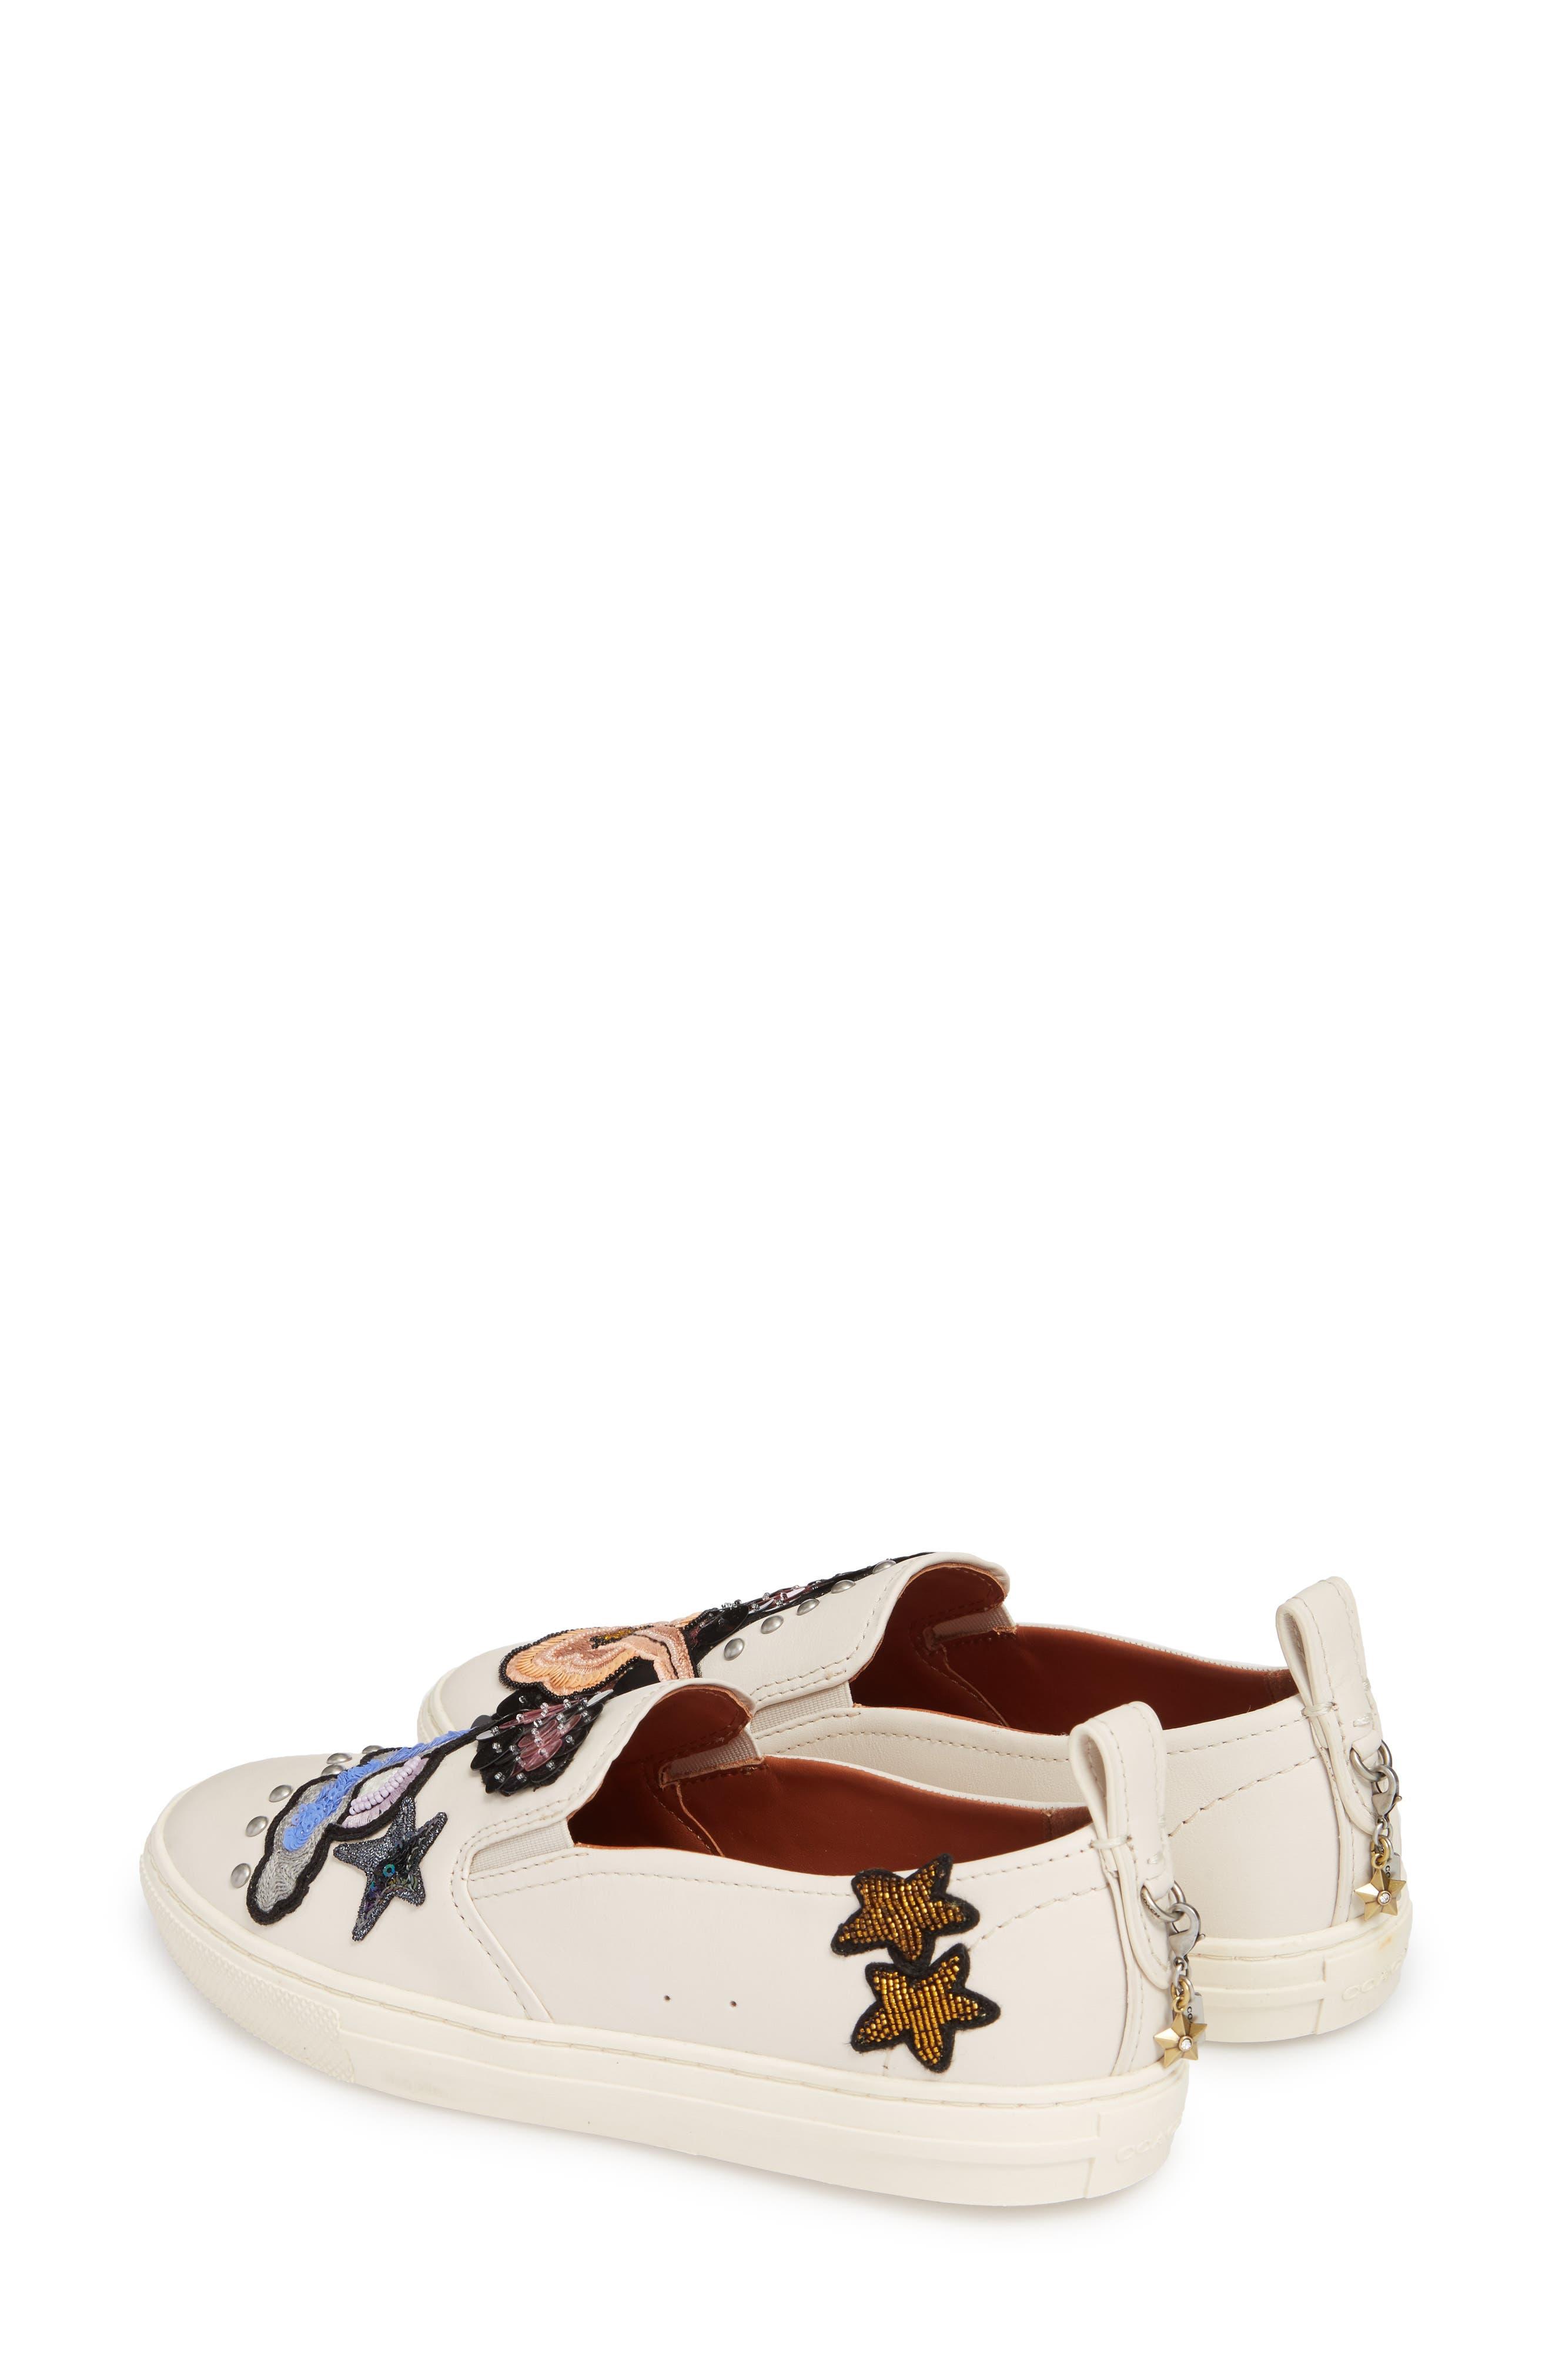 Star Patch Slip-On Sneaker,                             Alternate thumbnail 2, color,                             Chalk Leather